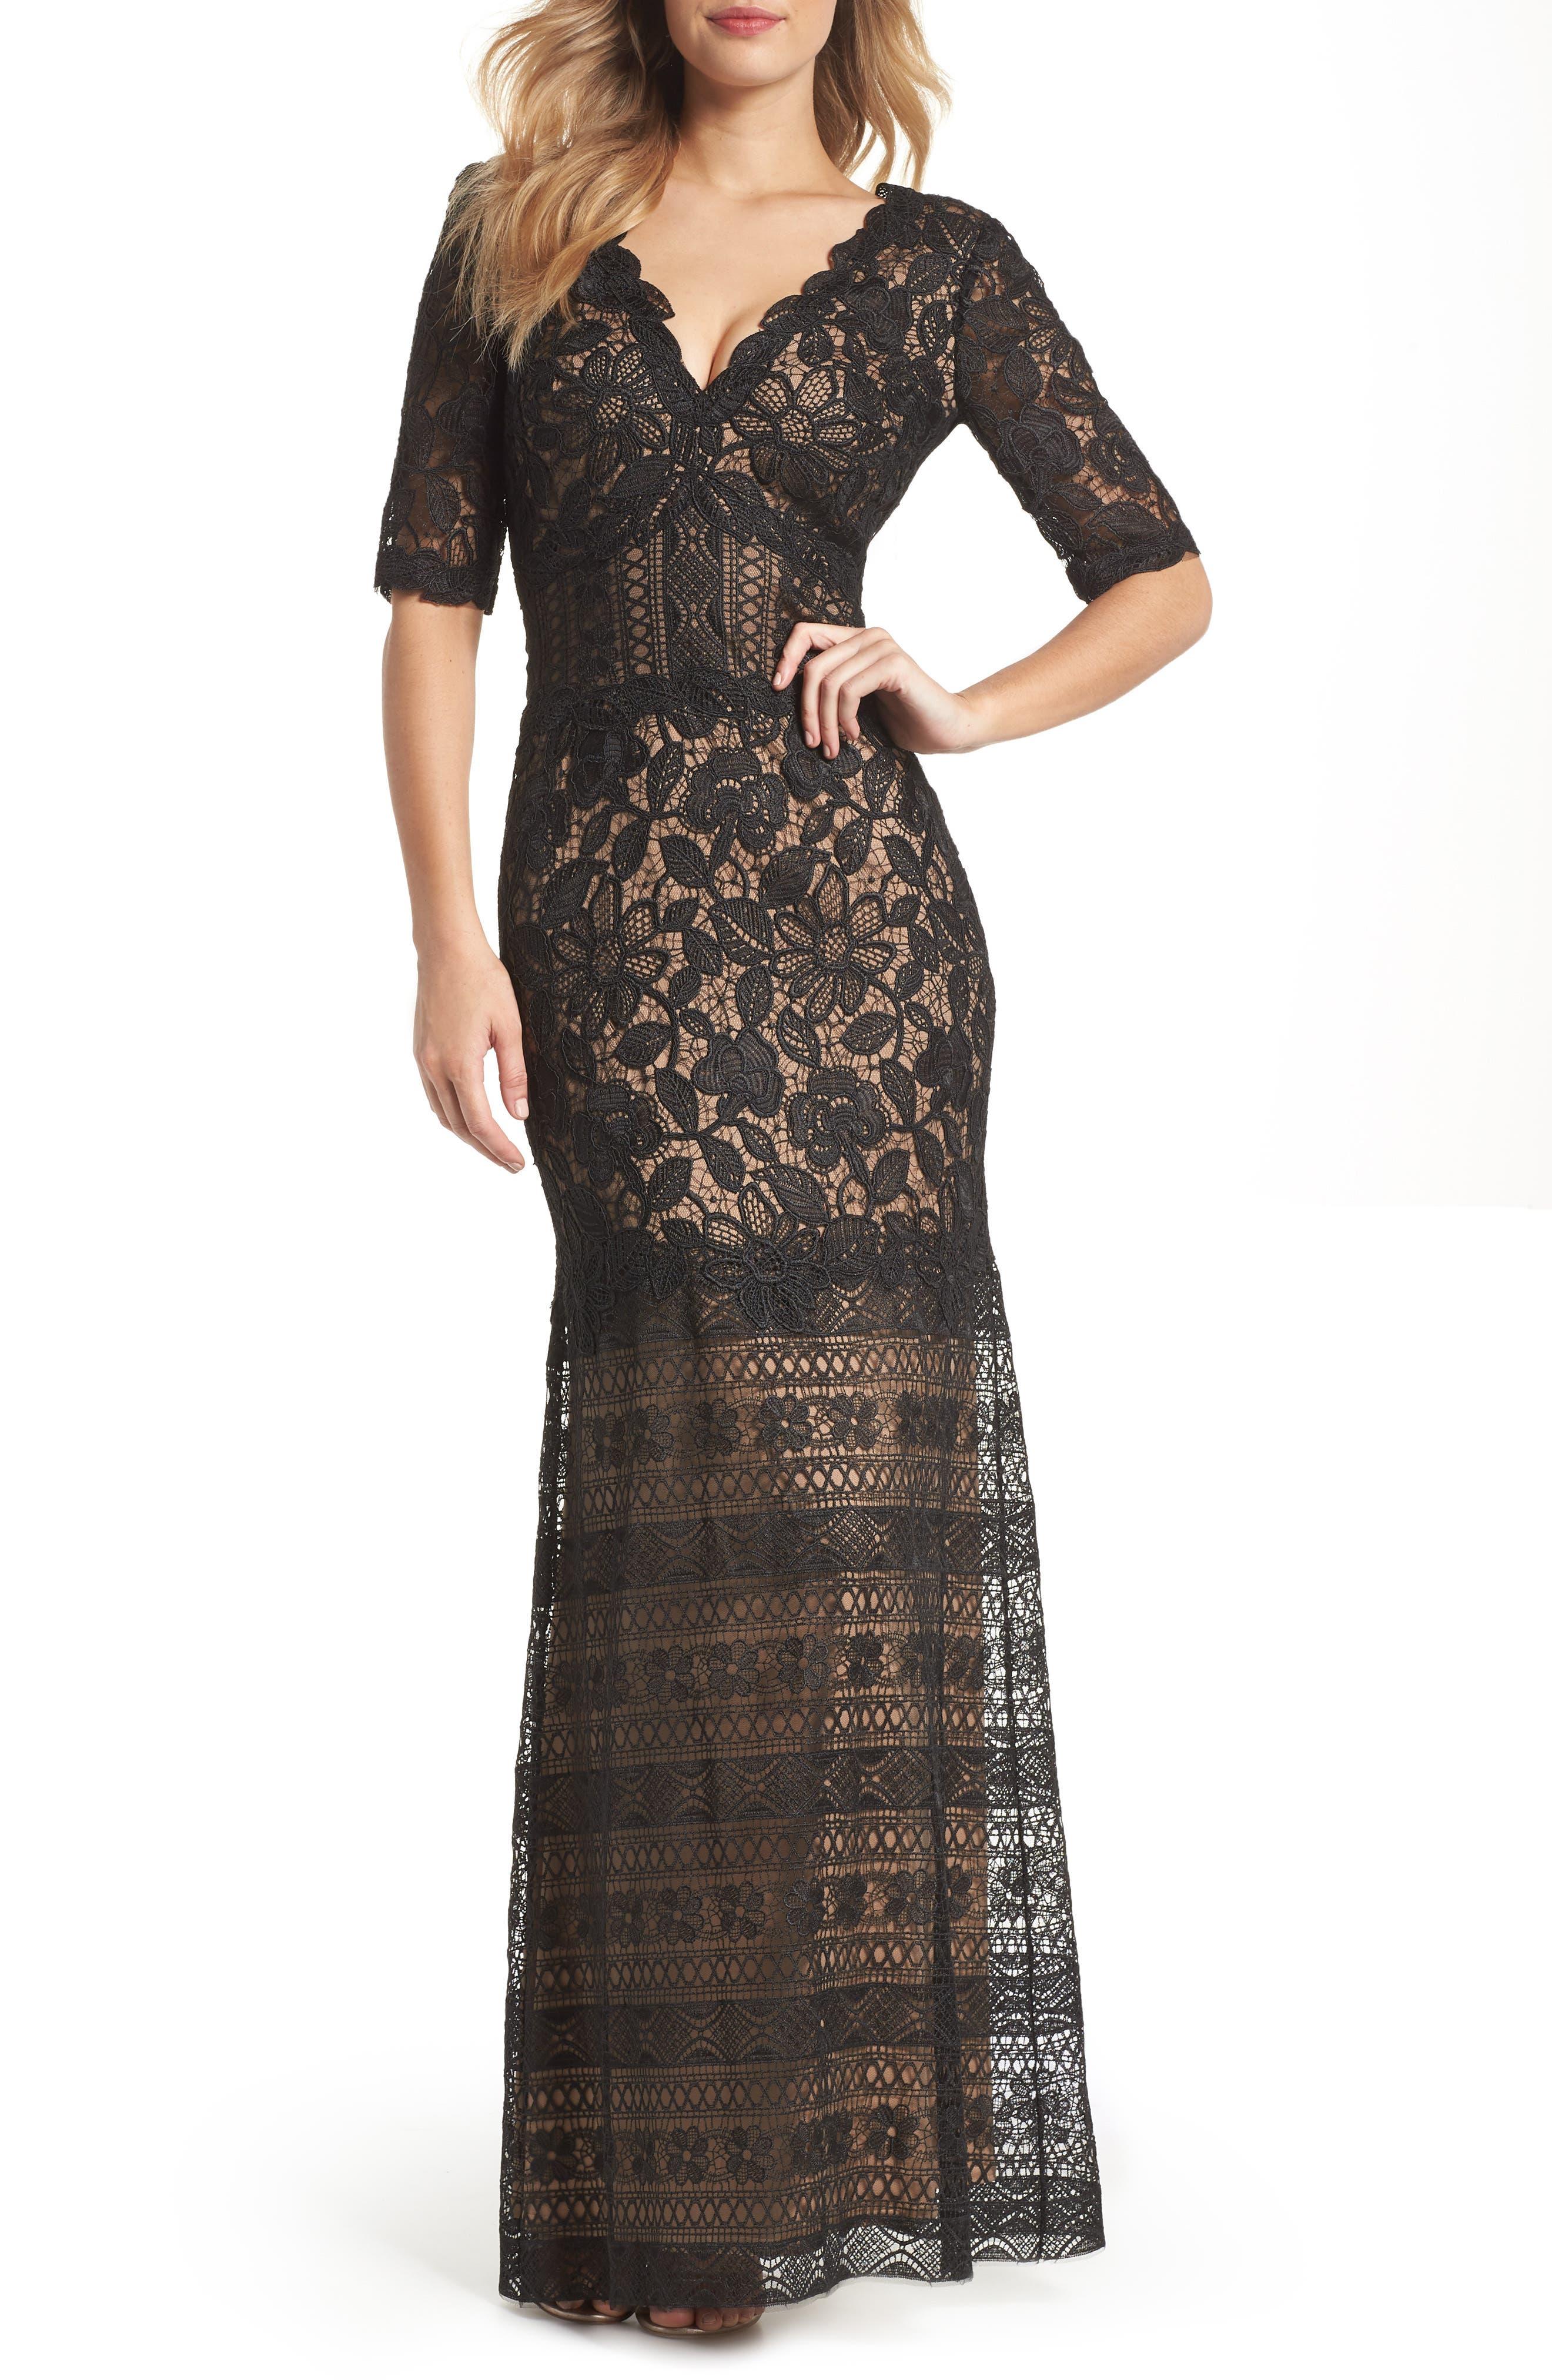 Lace Trumpet Gown,                             Main thumbnail 1, color,                             Black/ Nude